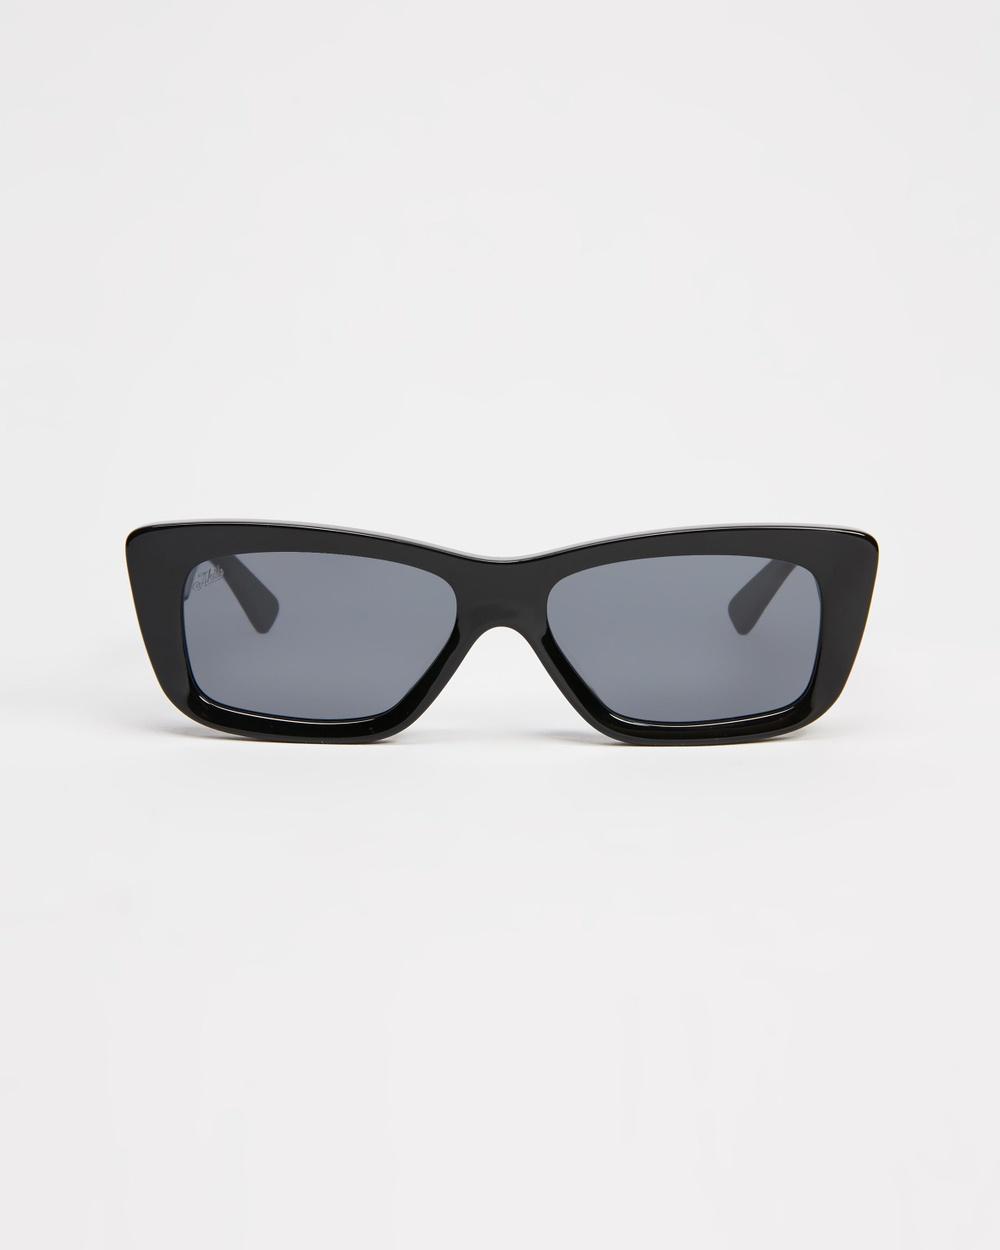 AKILA Frenzy Sunglasses Black & Silver